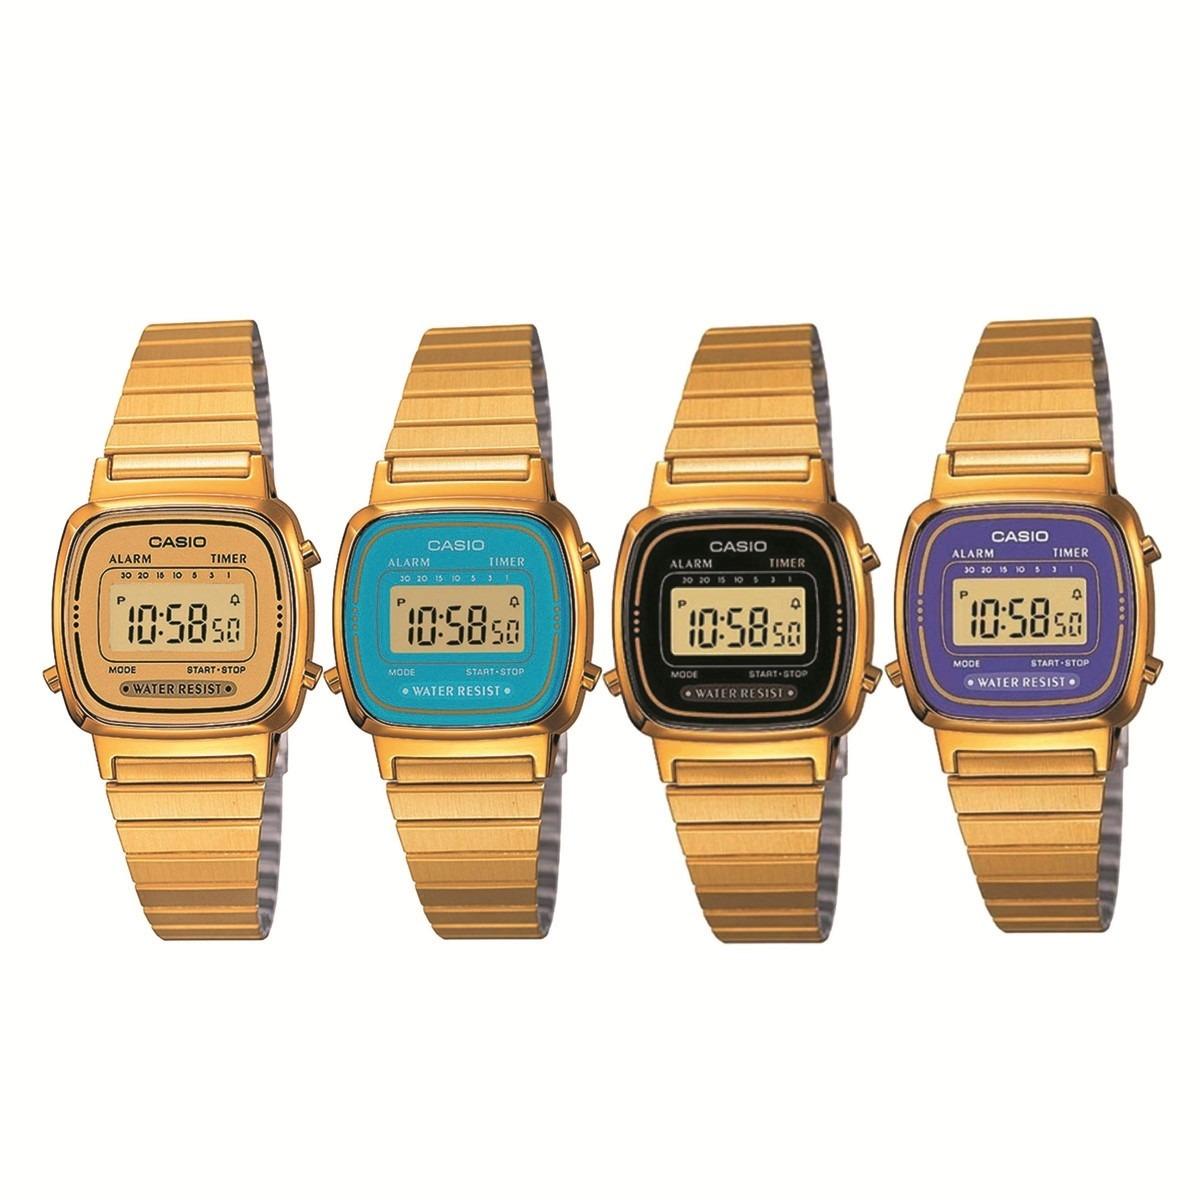 3be1dbb2858 relógio casio la670 (tamanho mini )várias cores vintage. Carregando zoom.